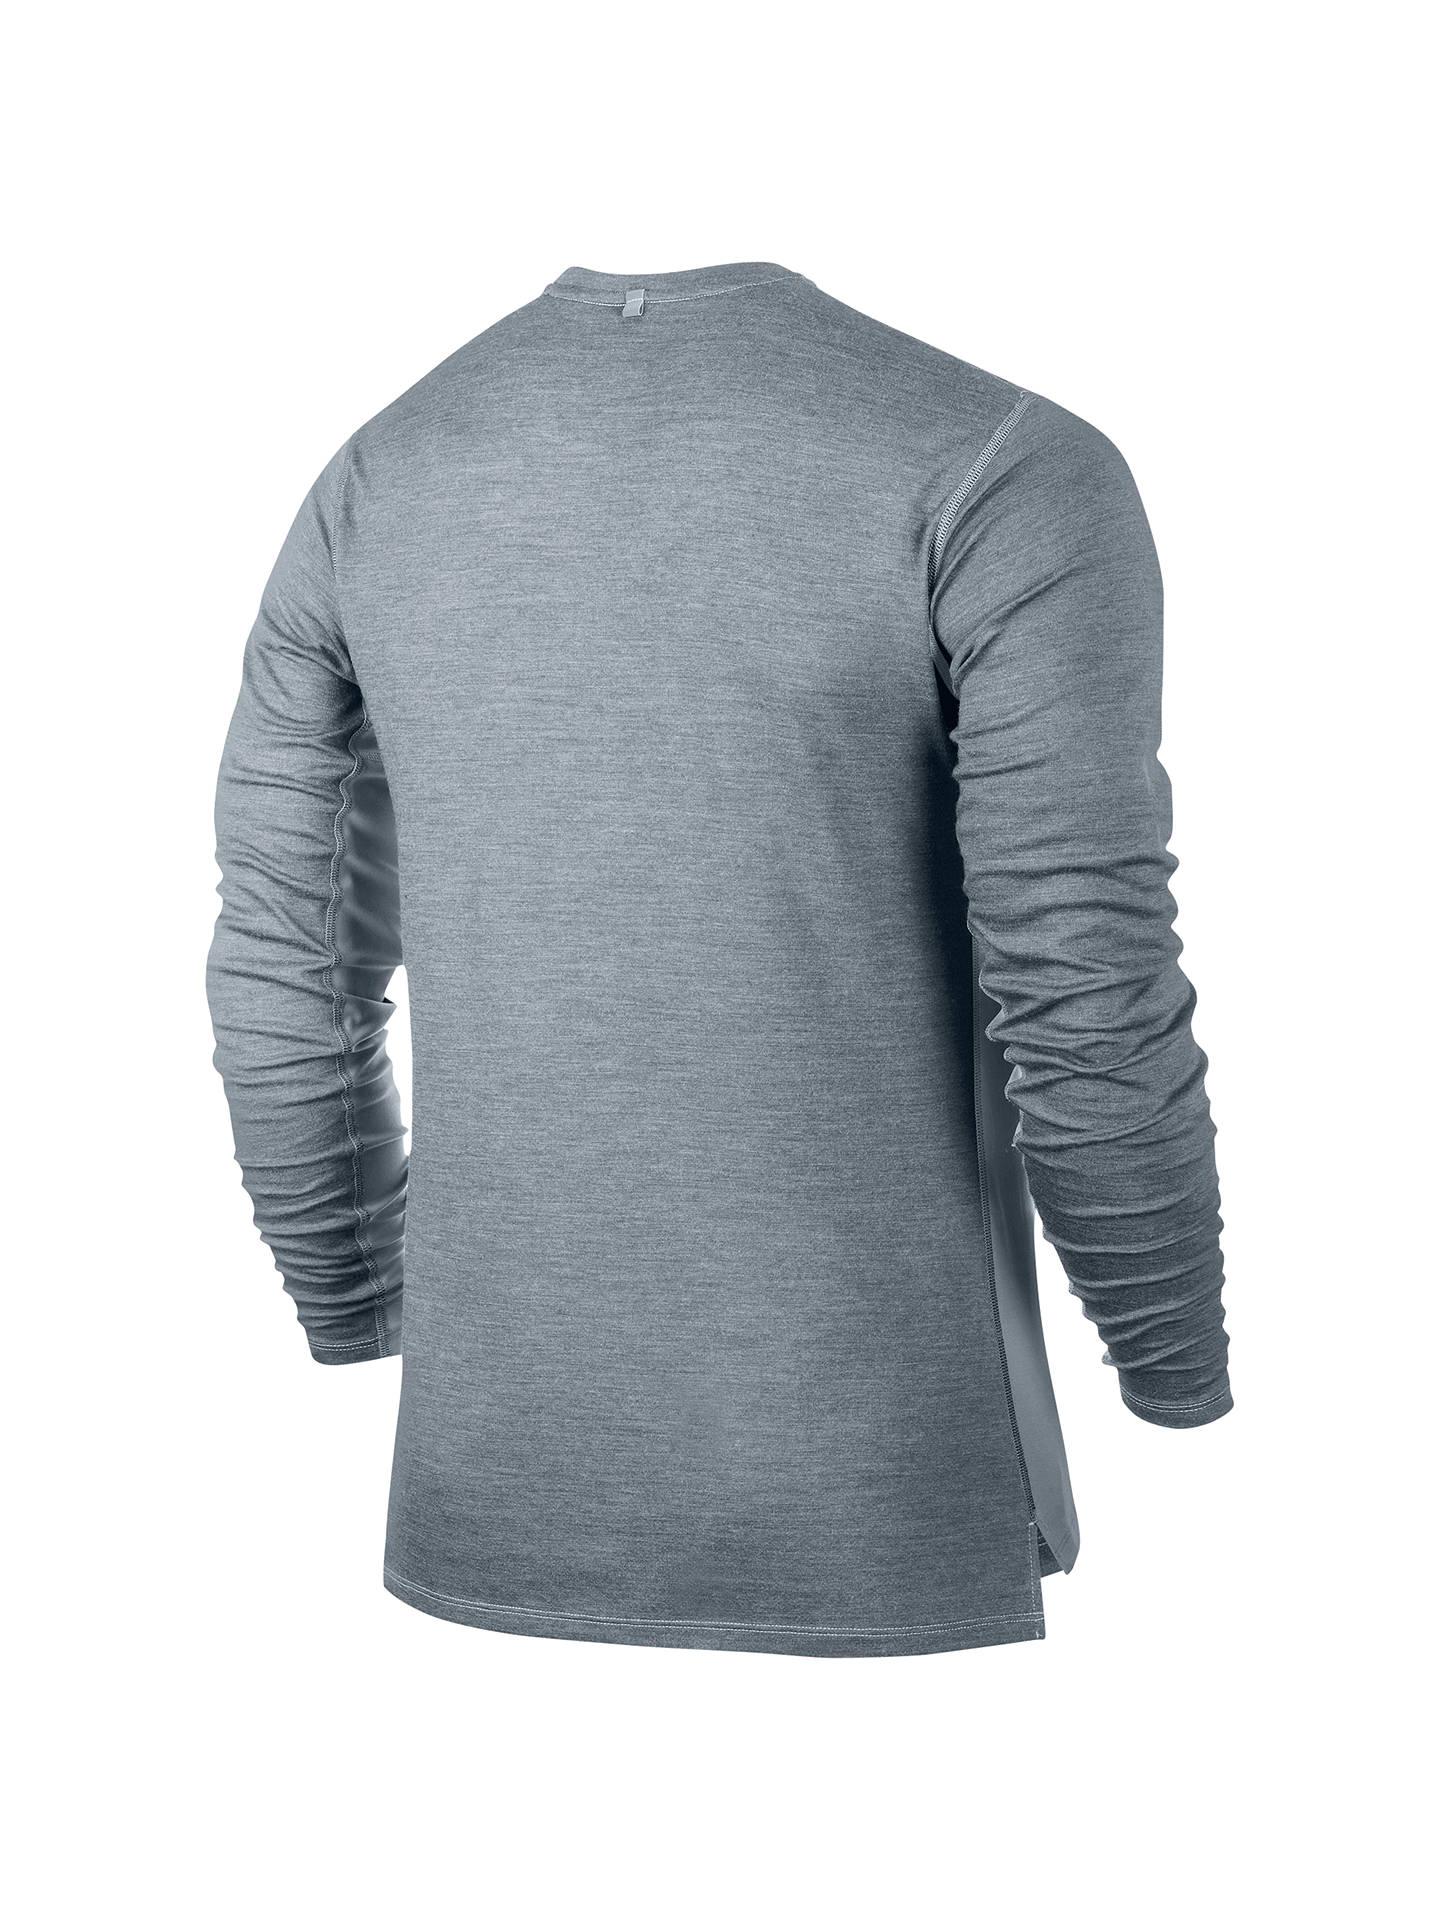 02b8f9202 Nike Dri-FIT Wool Long Sleeve Running T-Shirt at John Lewis & Partners